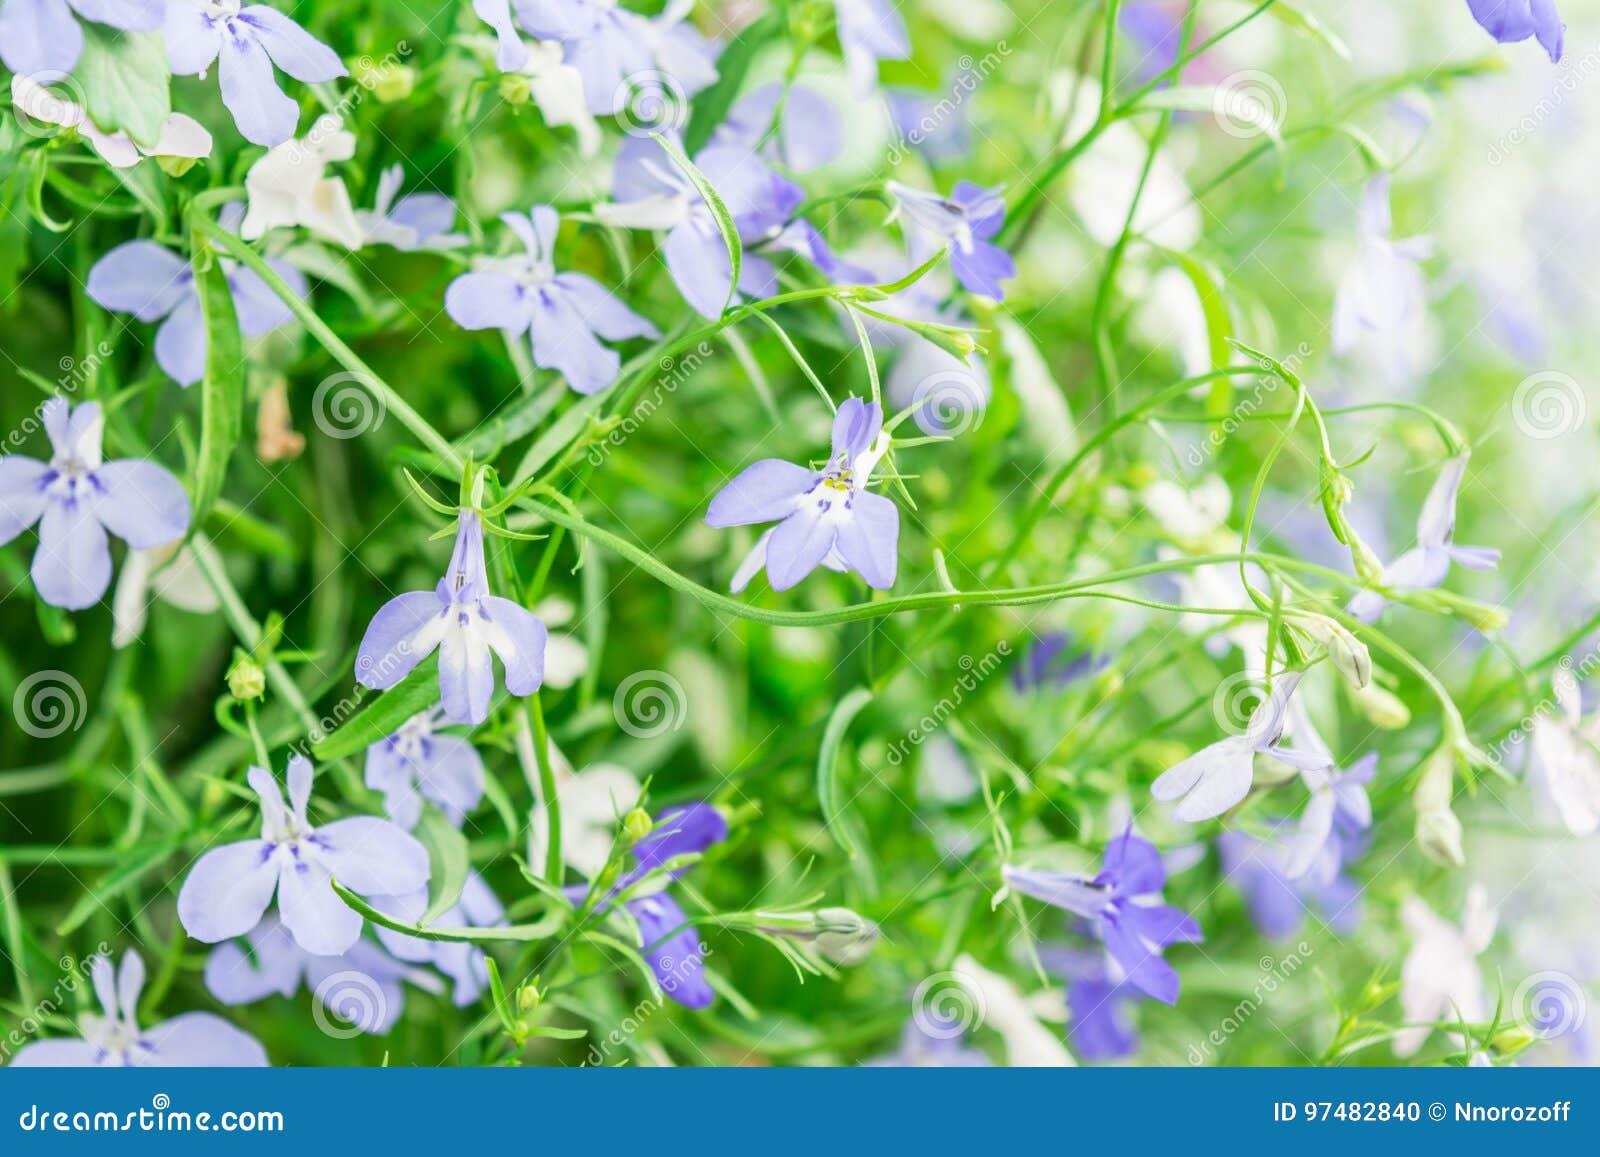 Blue and white trailing lobelia sapphire flowers or edging lobelia blue and white trailing lobelia sapphire flowers or edging lobelia garden lobelia mightylinksfo